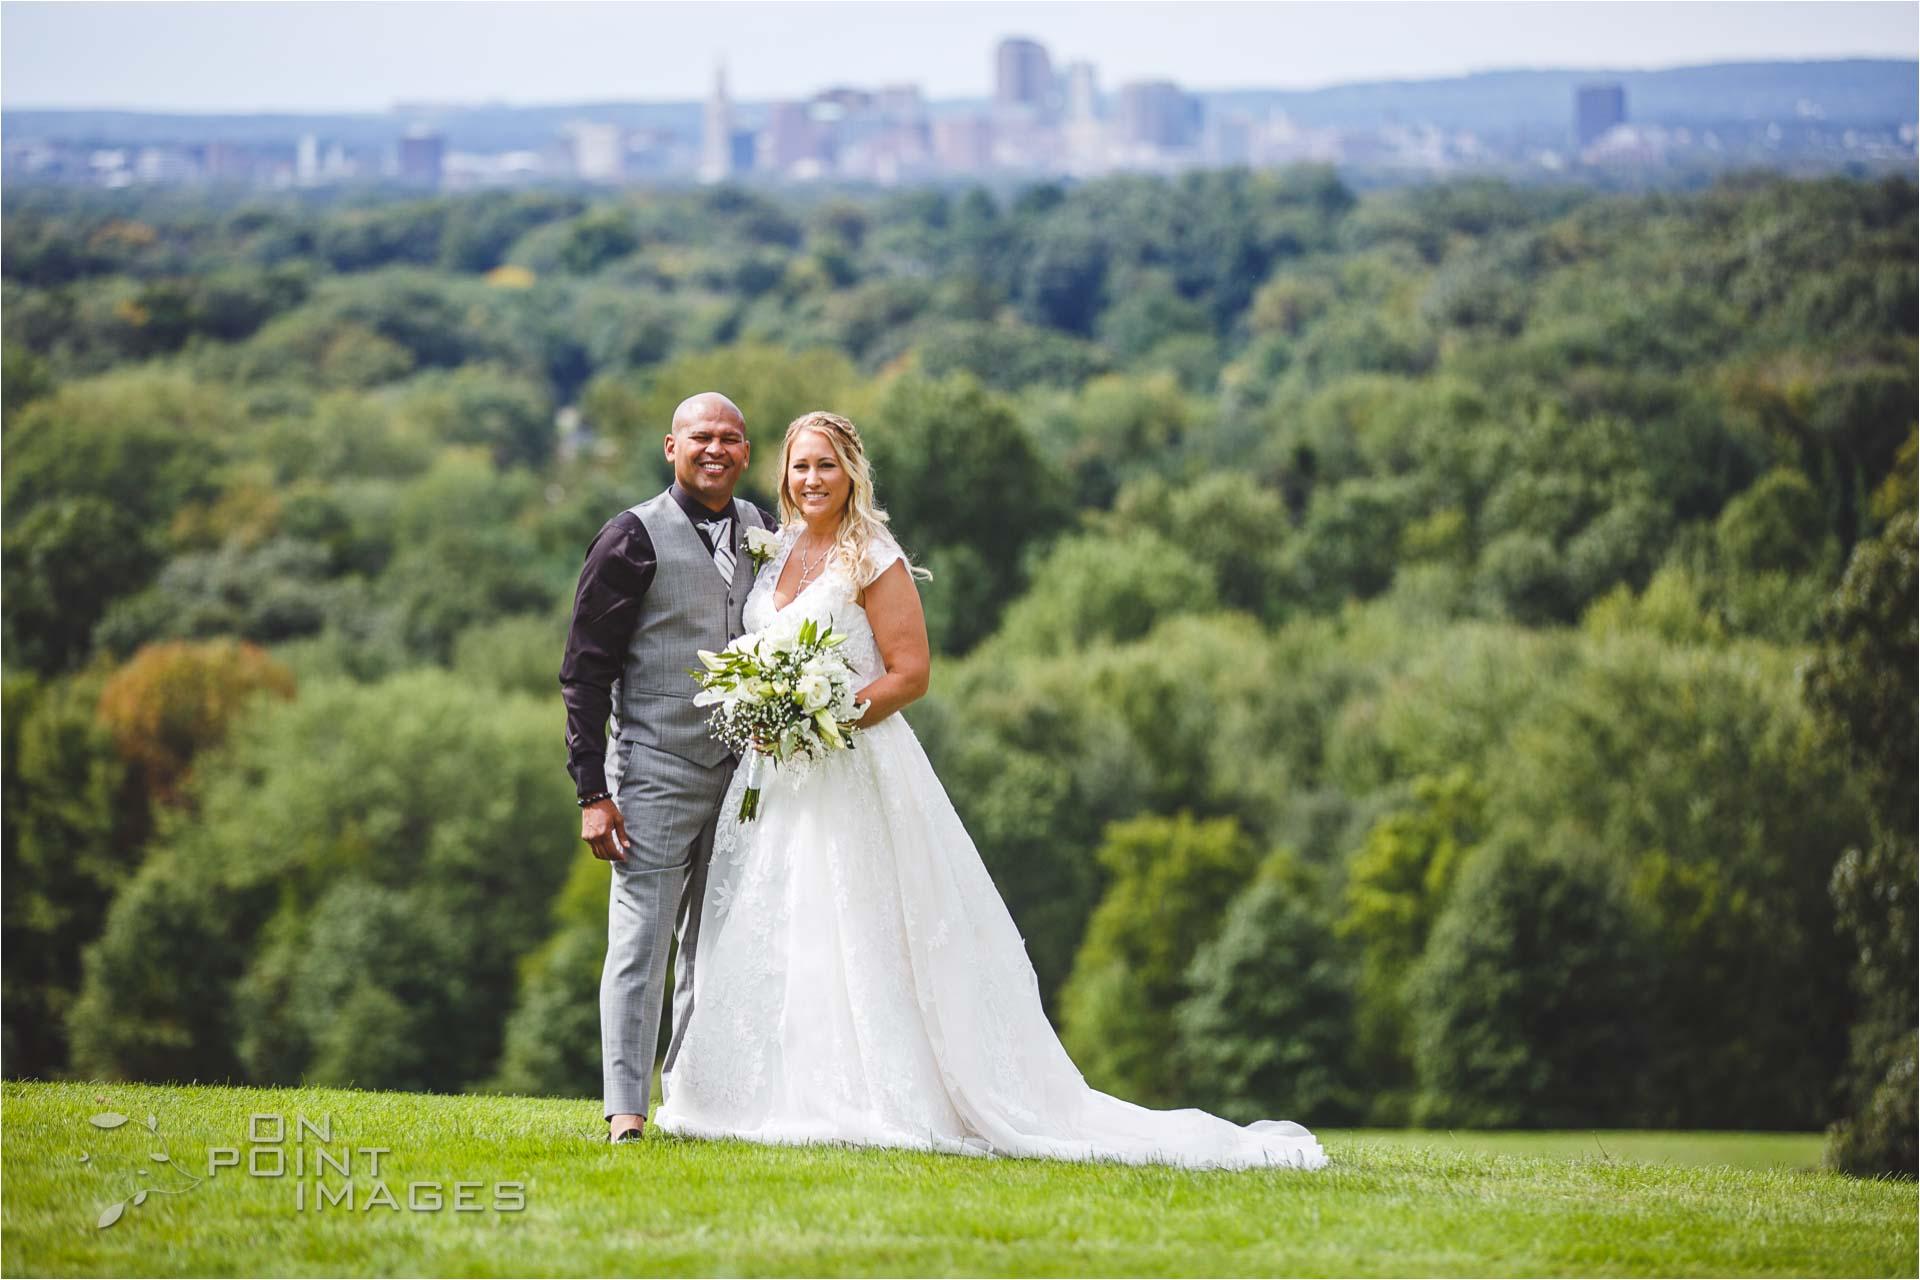 Wickham-Park-English-Garden-Wedding-Images-20.jpg